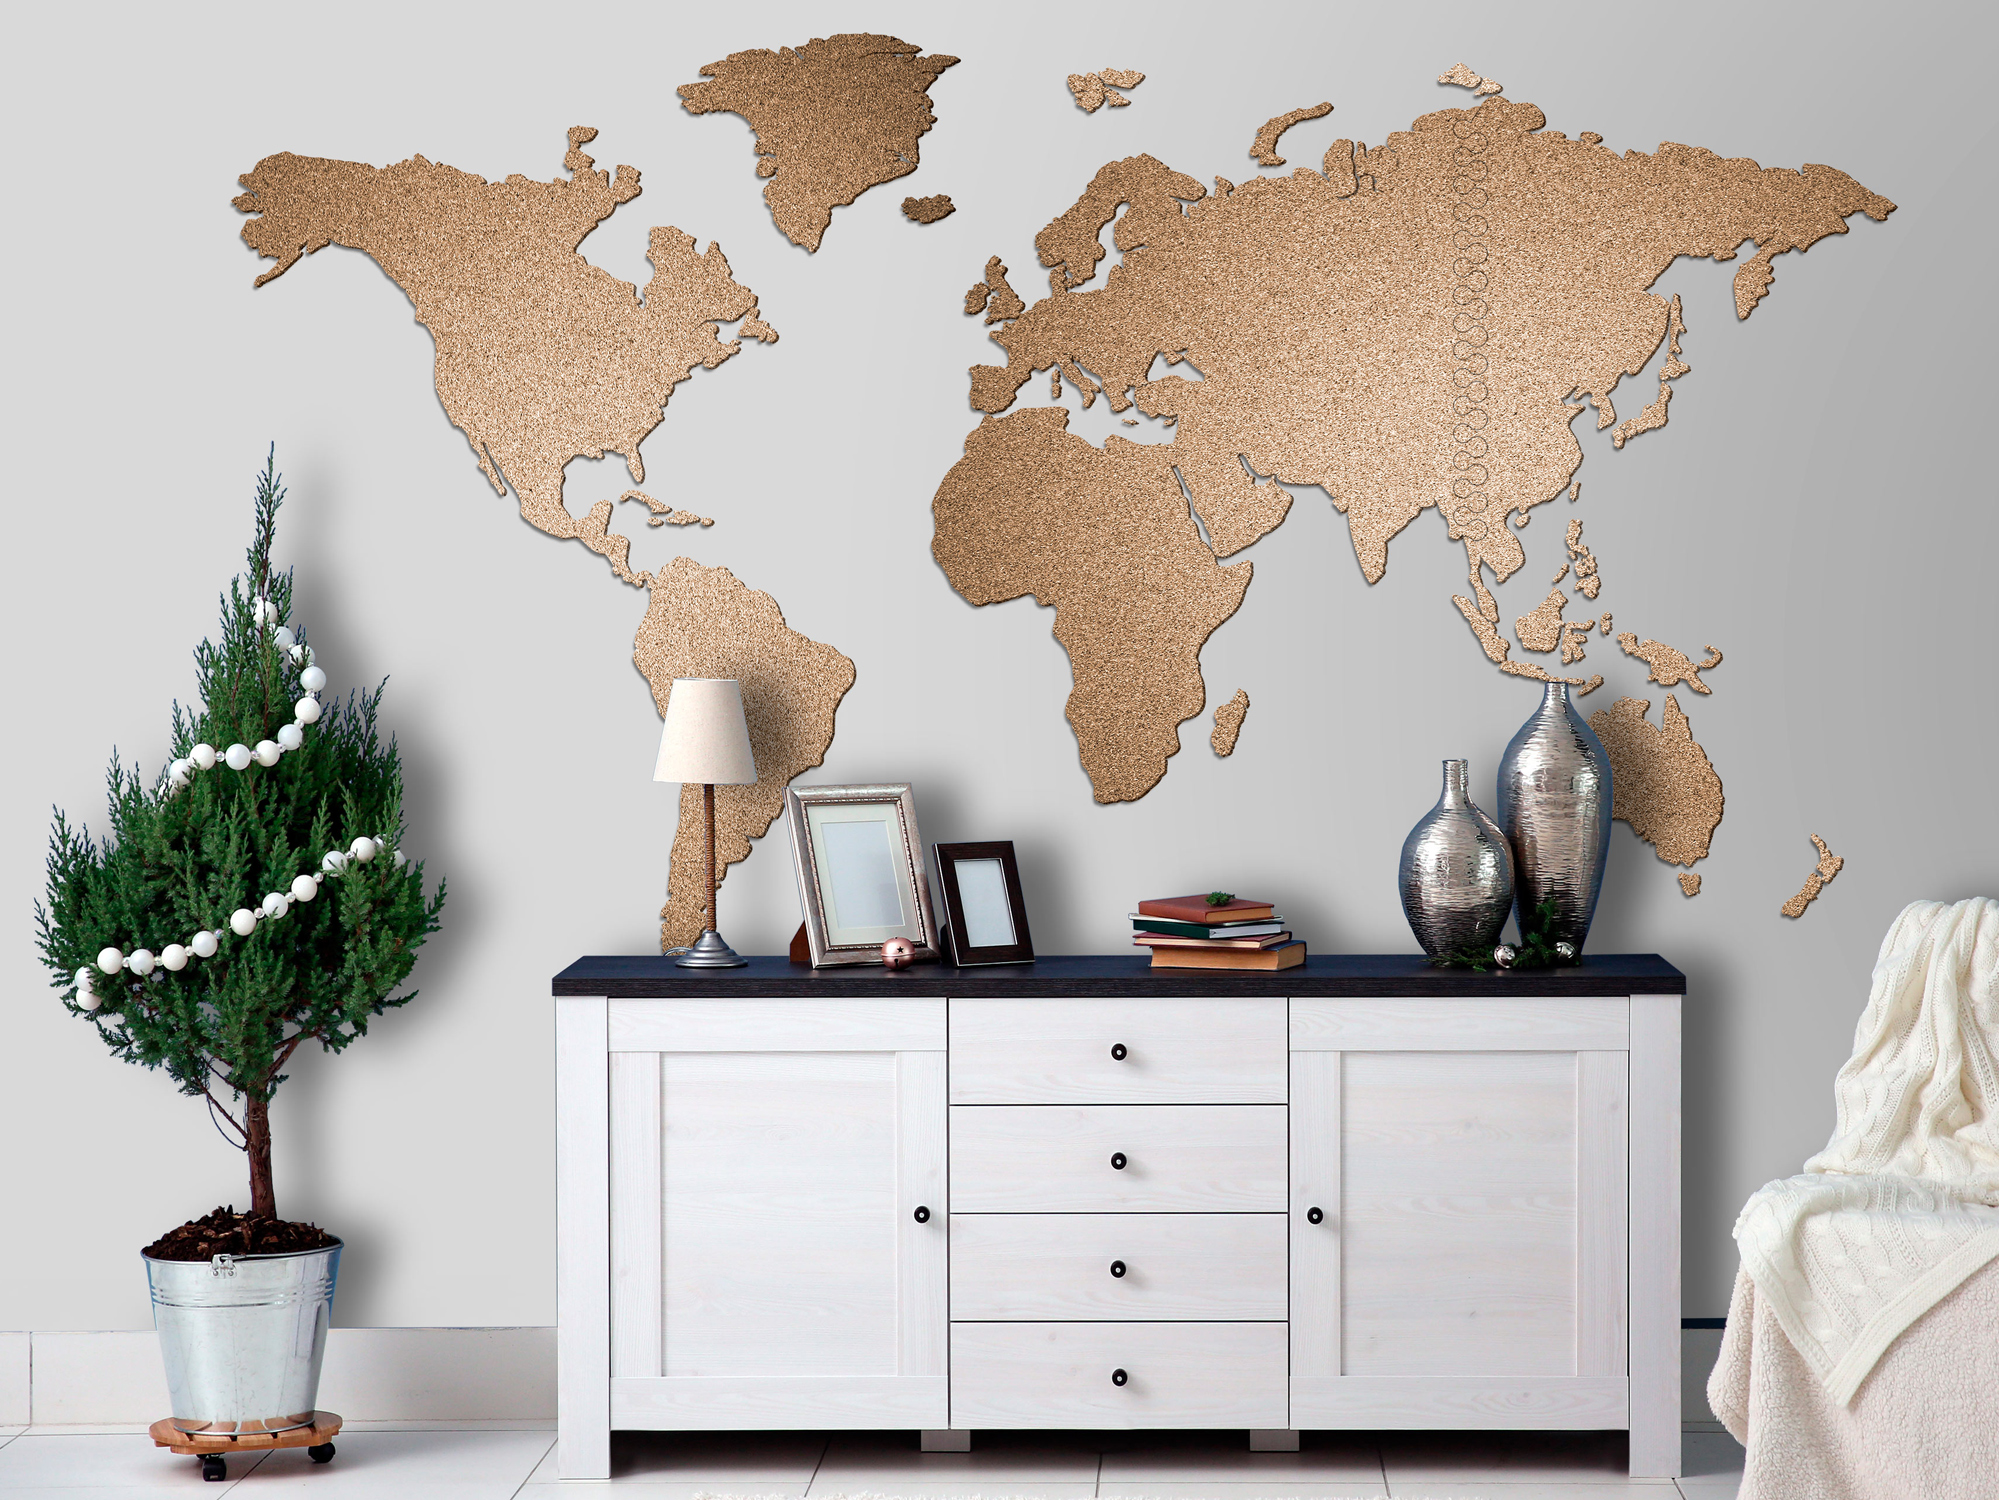 weltkarte pinnwand kork landkarte korktafel xxl memoboard selbstklebend korkwand ebay. Black Bedroom Furniture Sets. Home Design Ideas